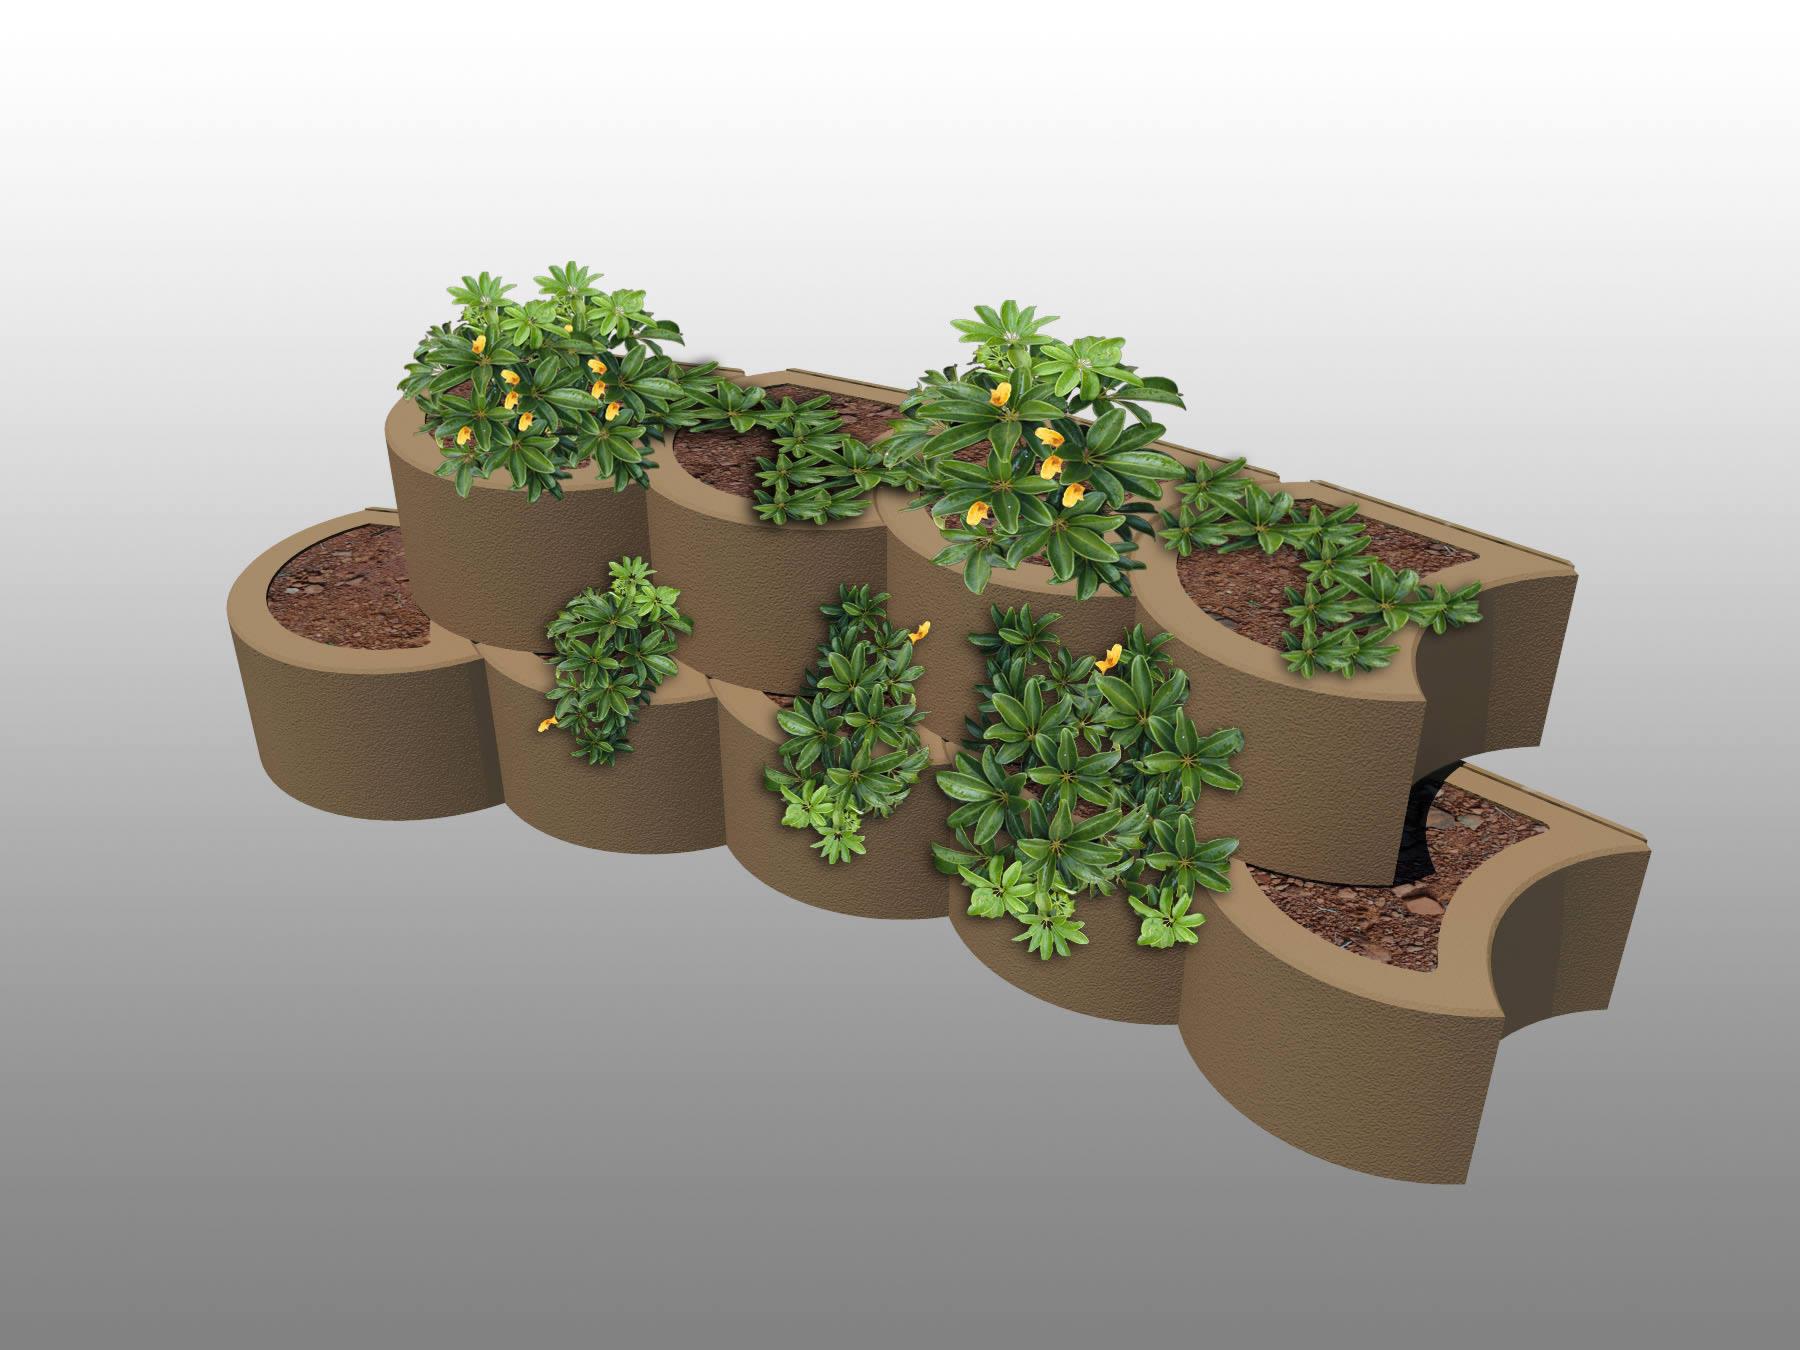 concave curve with plants